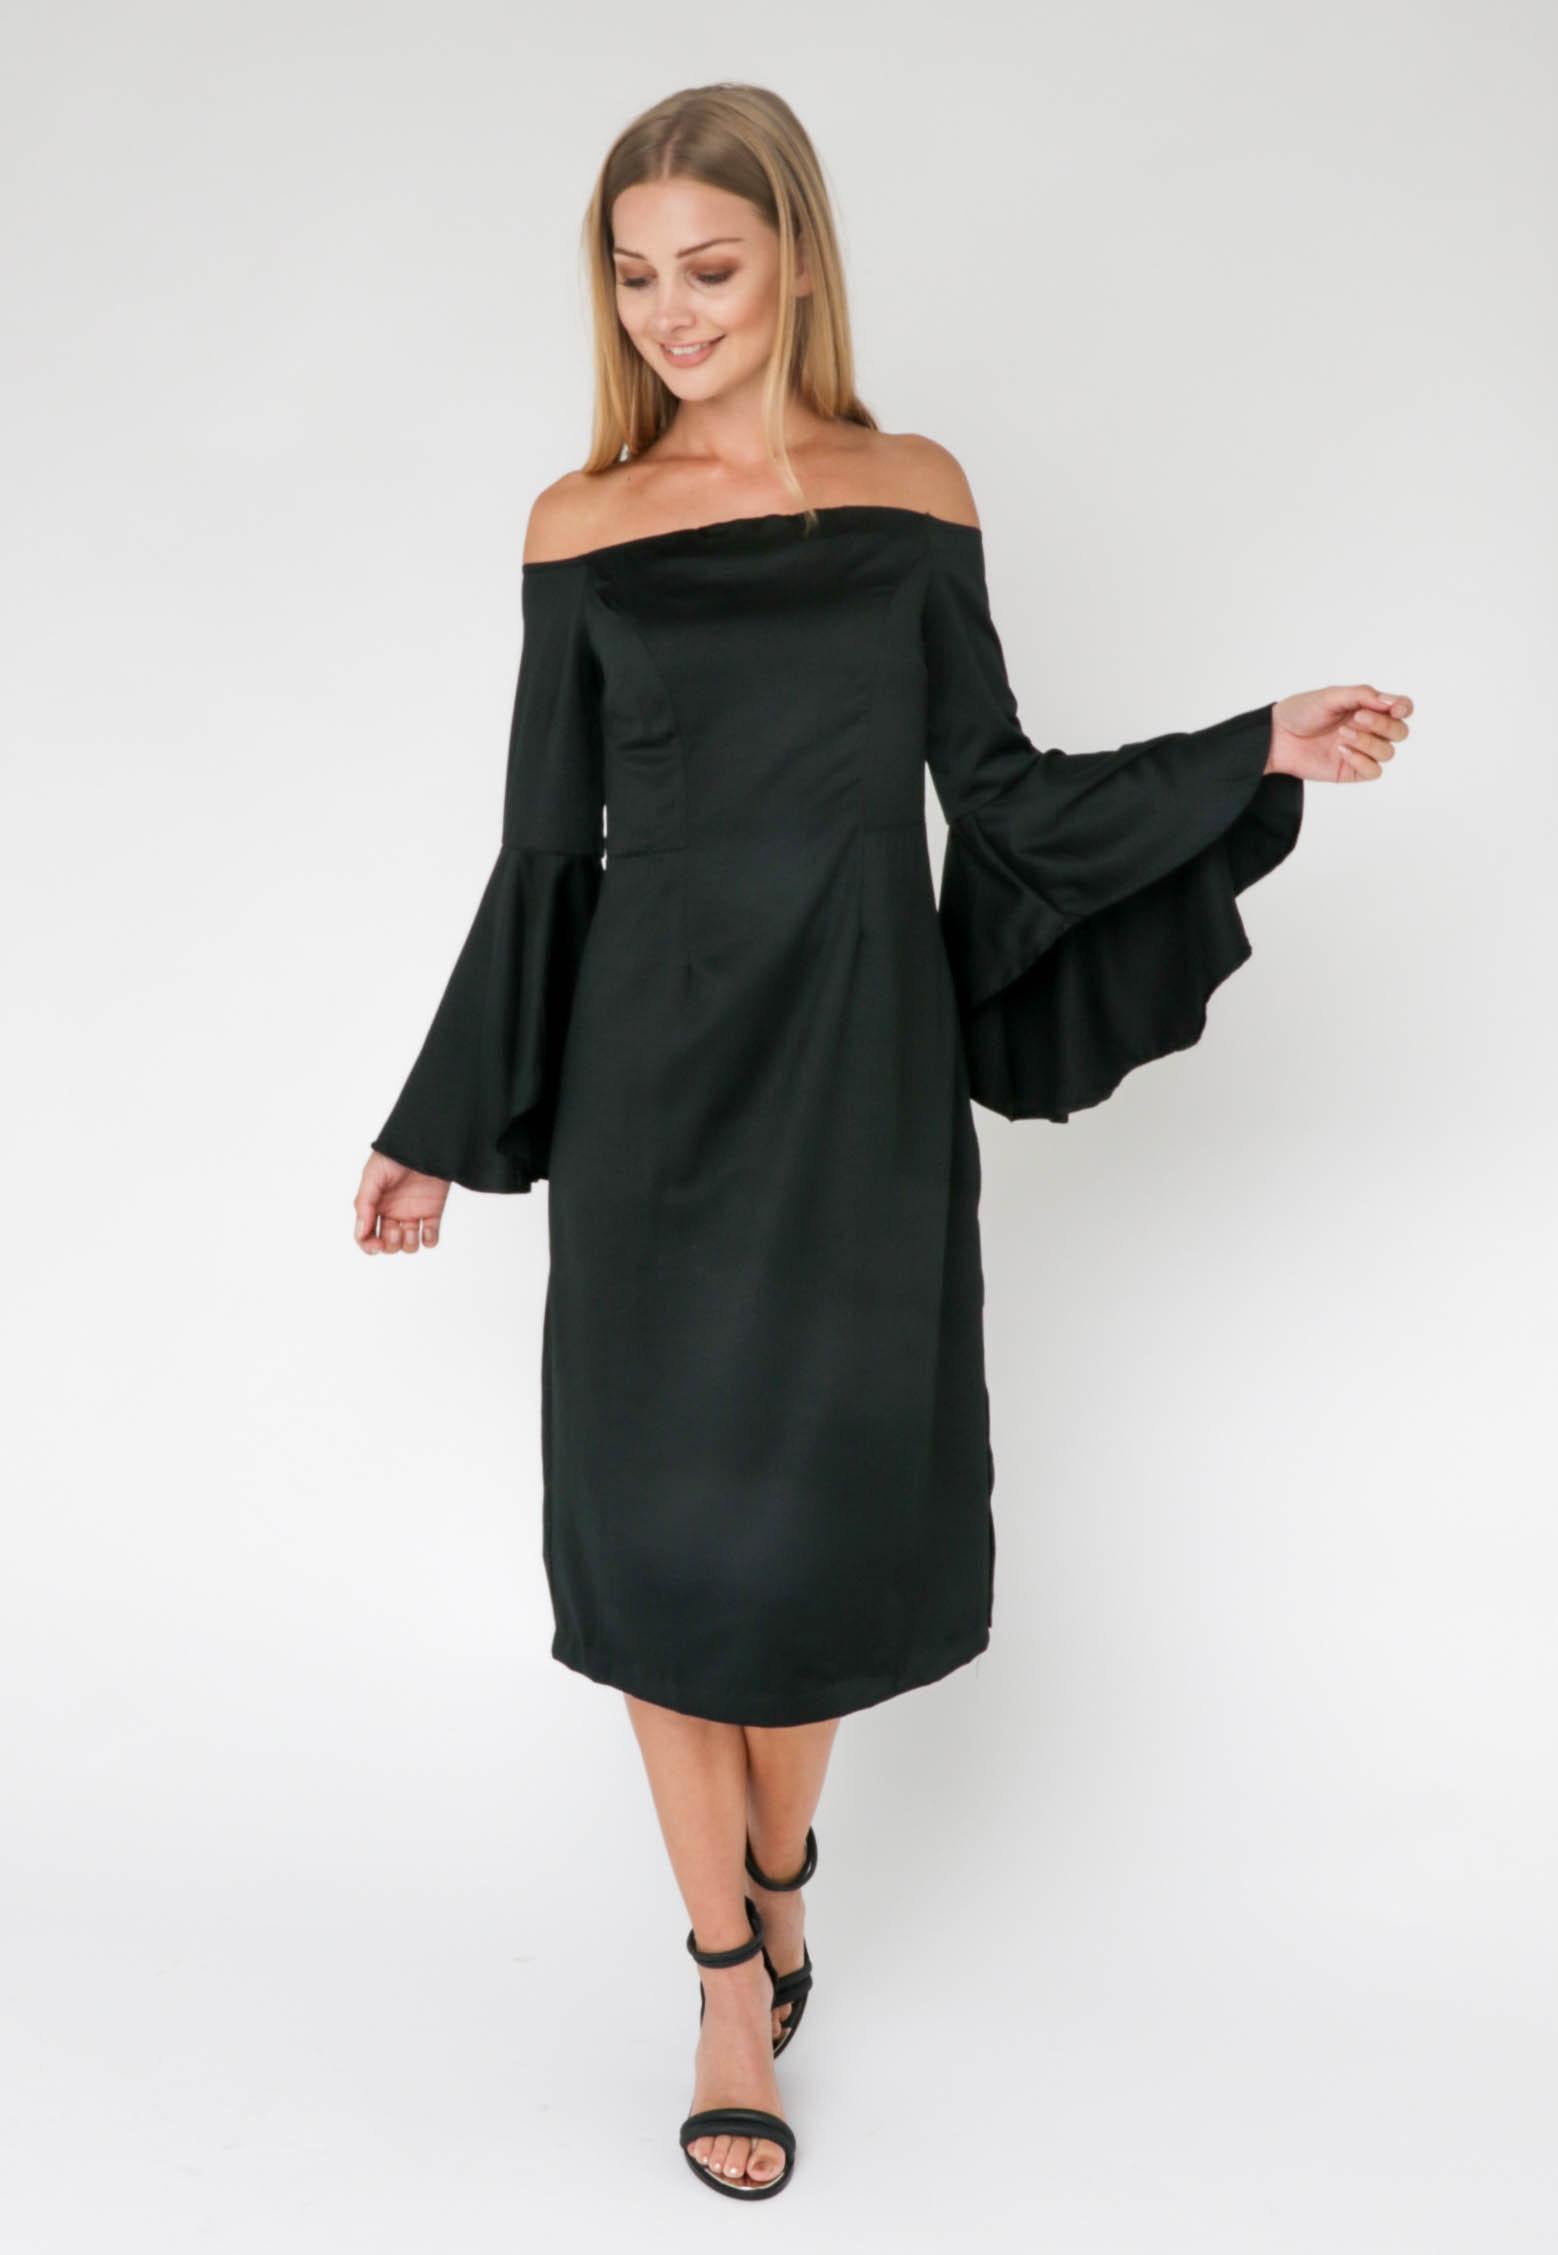 ELLY DRESS - BLACK